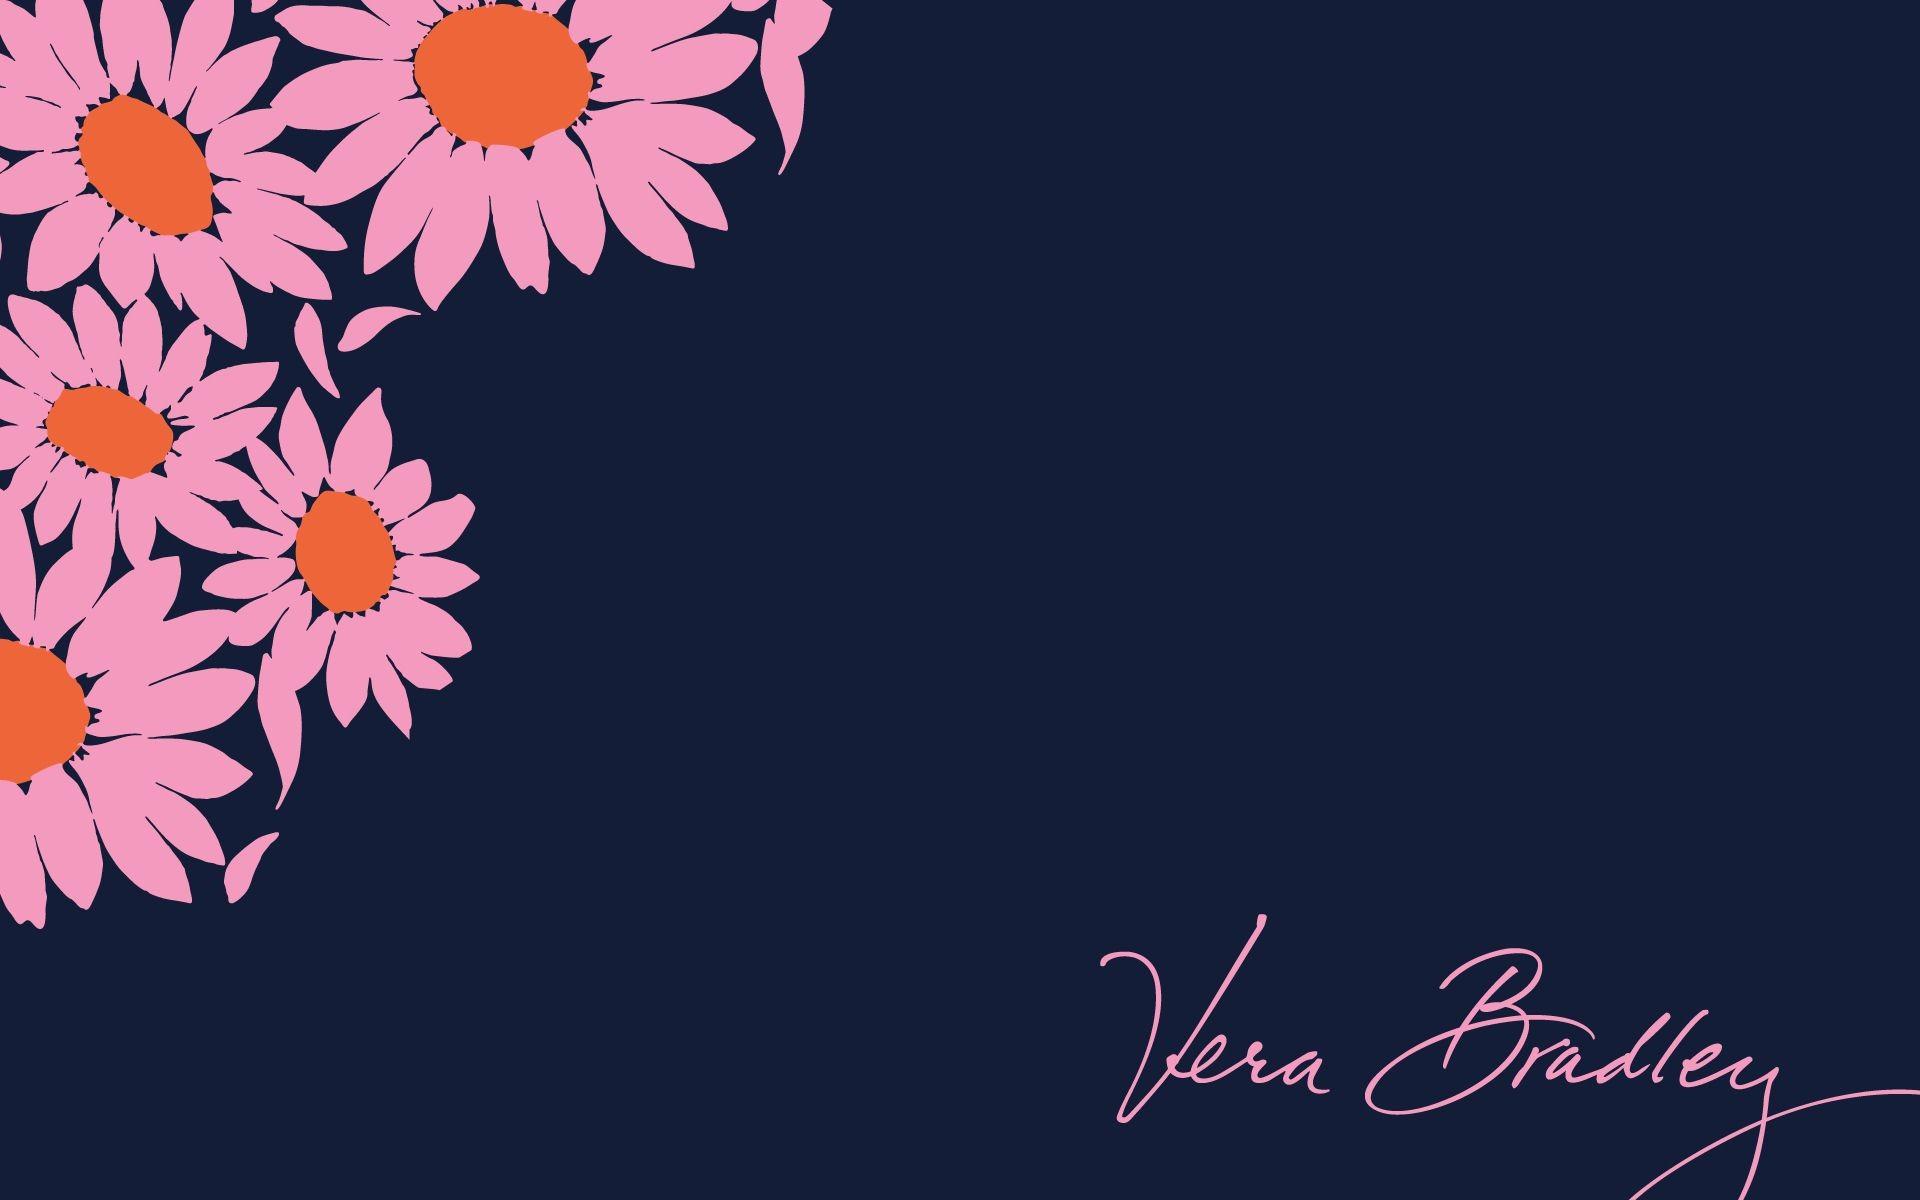 Vera Bradley Loves Me Desktop Wallpaper